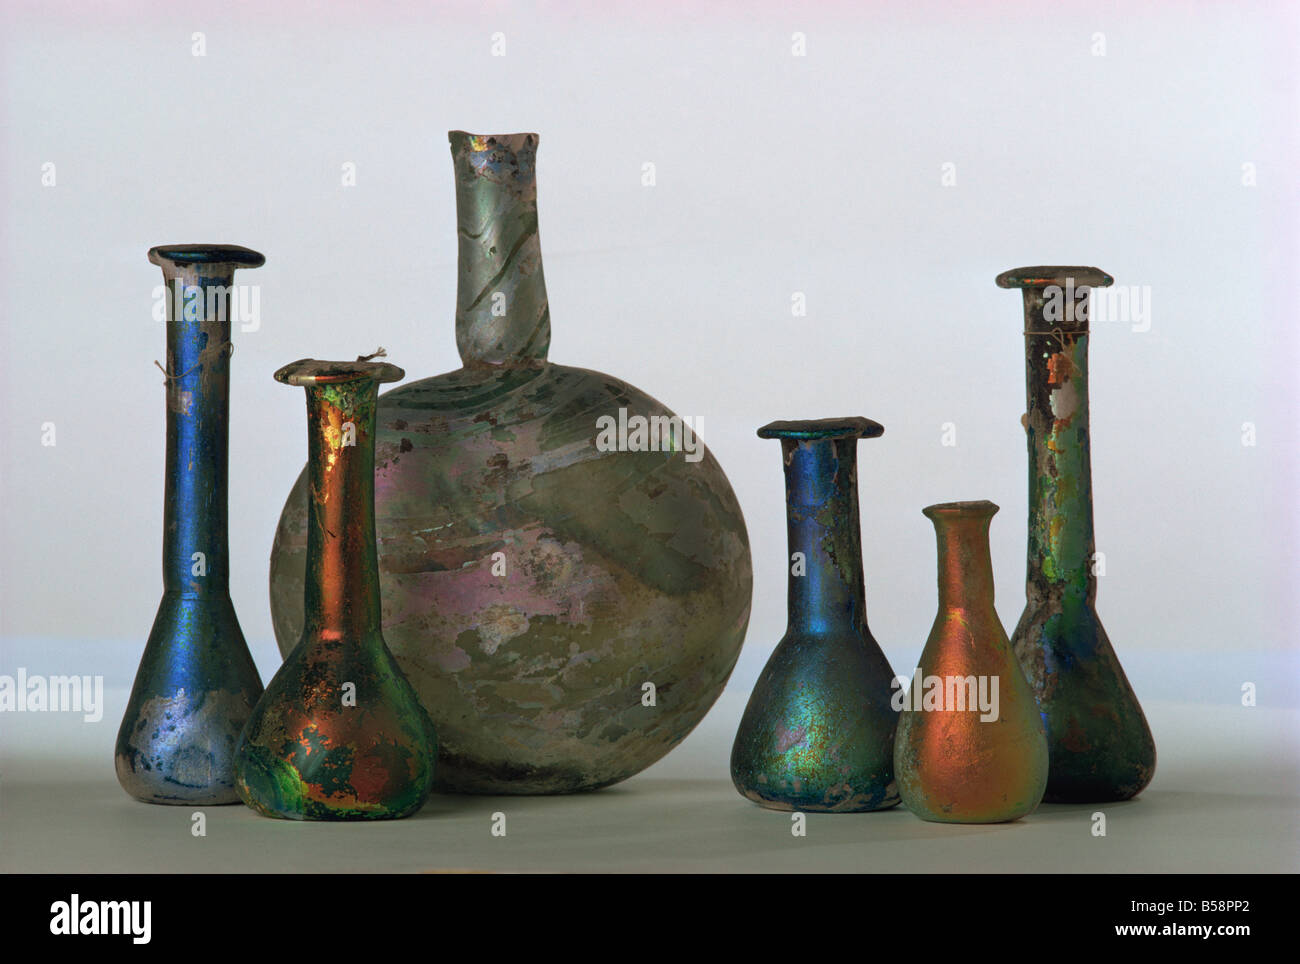 Mesopotamian antiquities, Louvre Museum, Paris, France, Europe - Stock Image